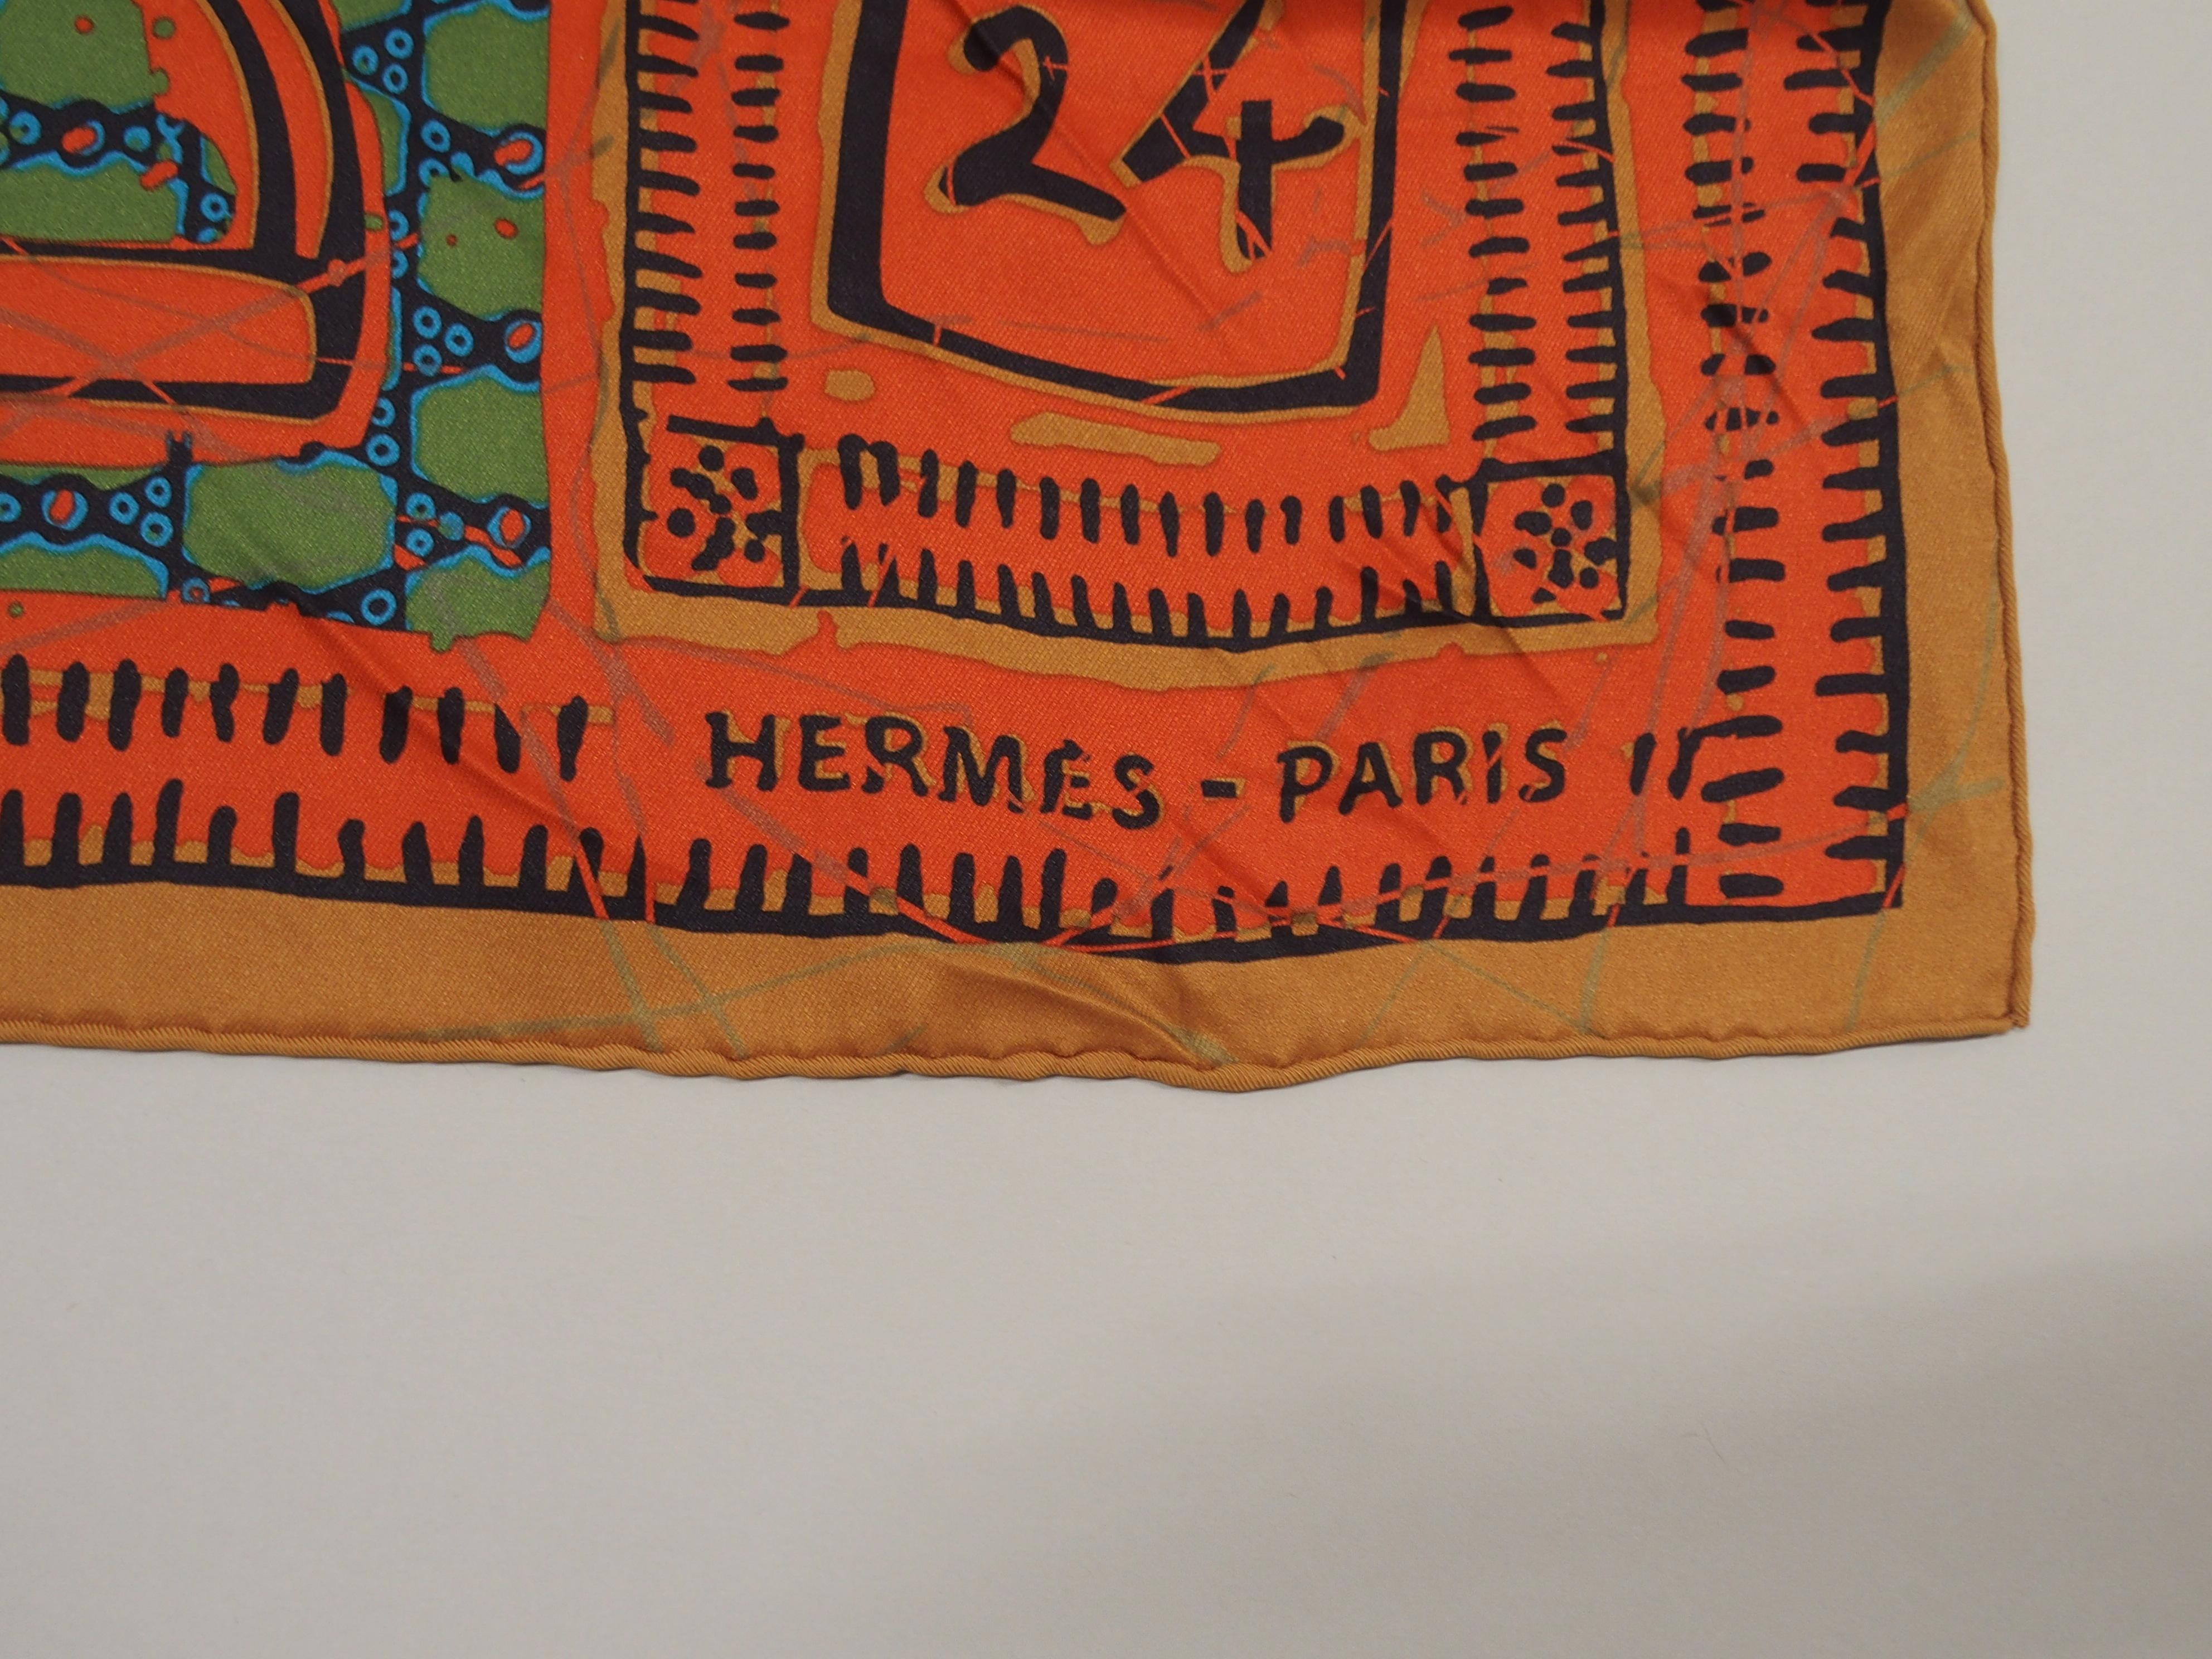 AN ORIGINAL LE BOUBOU H HERMES SILK SCARF designed by Karen Petrossian, in original box, 70 x 70cm - Image 3 of 5